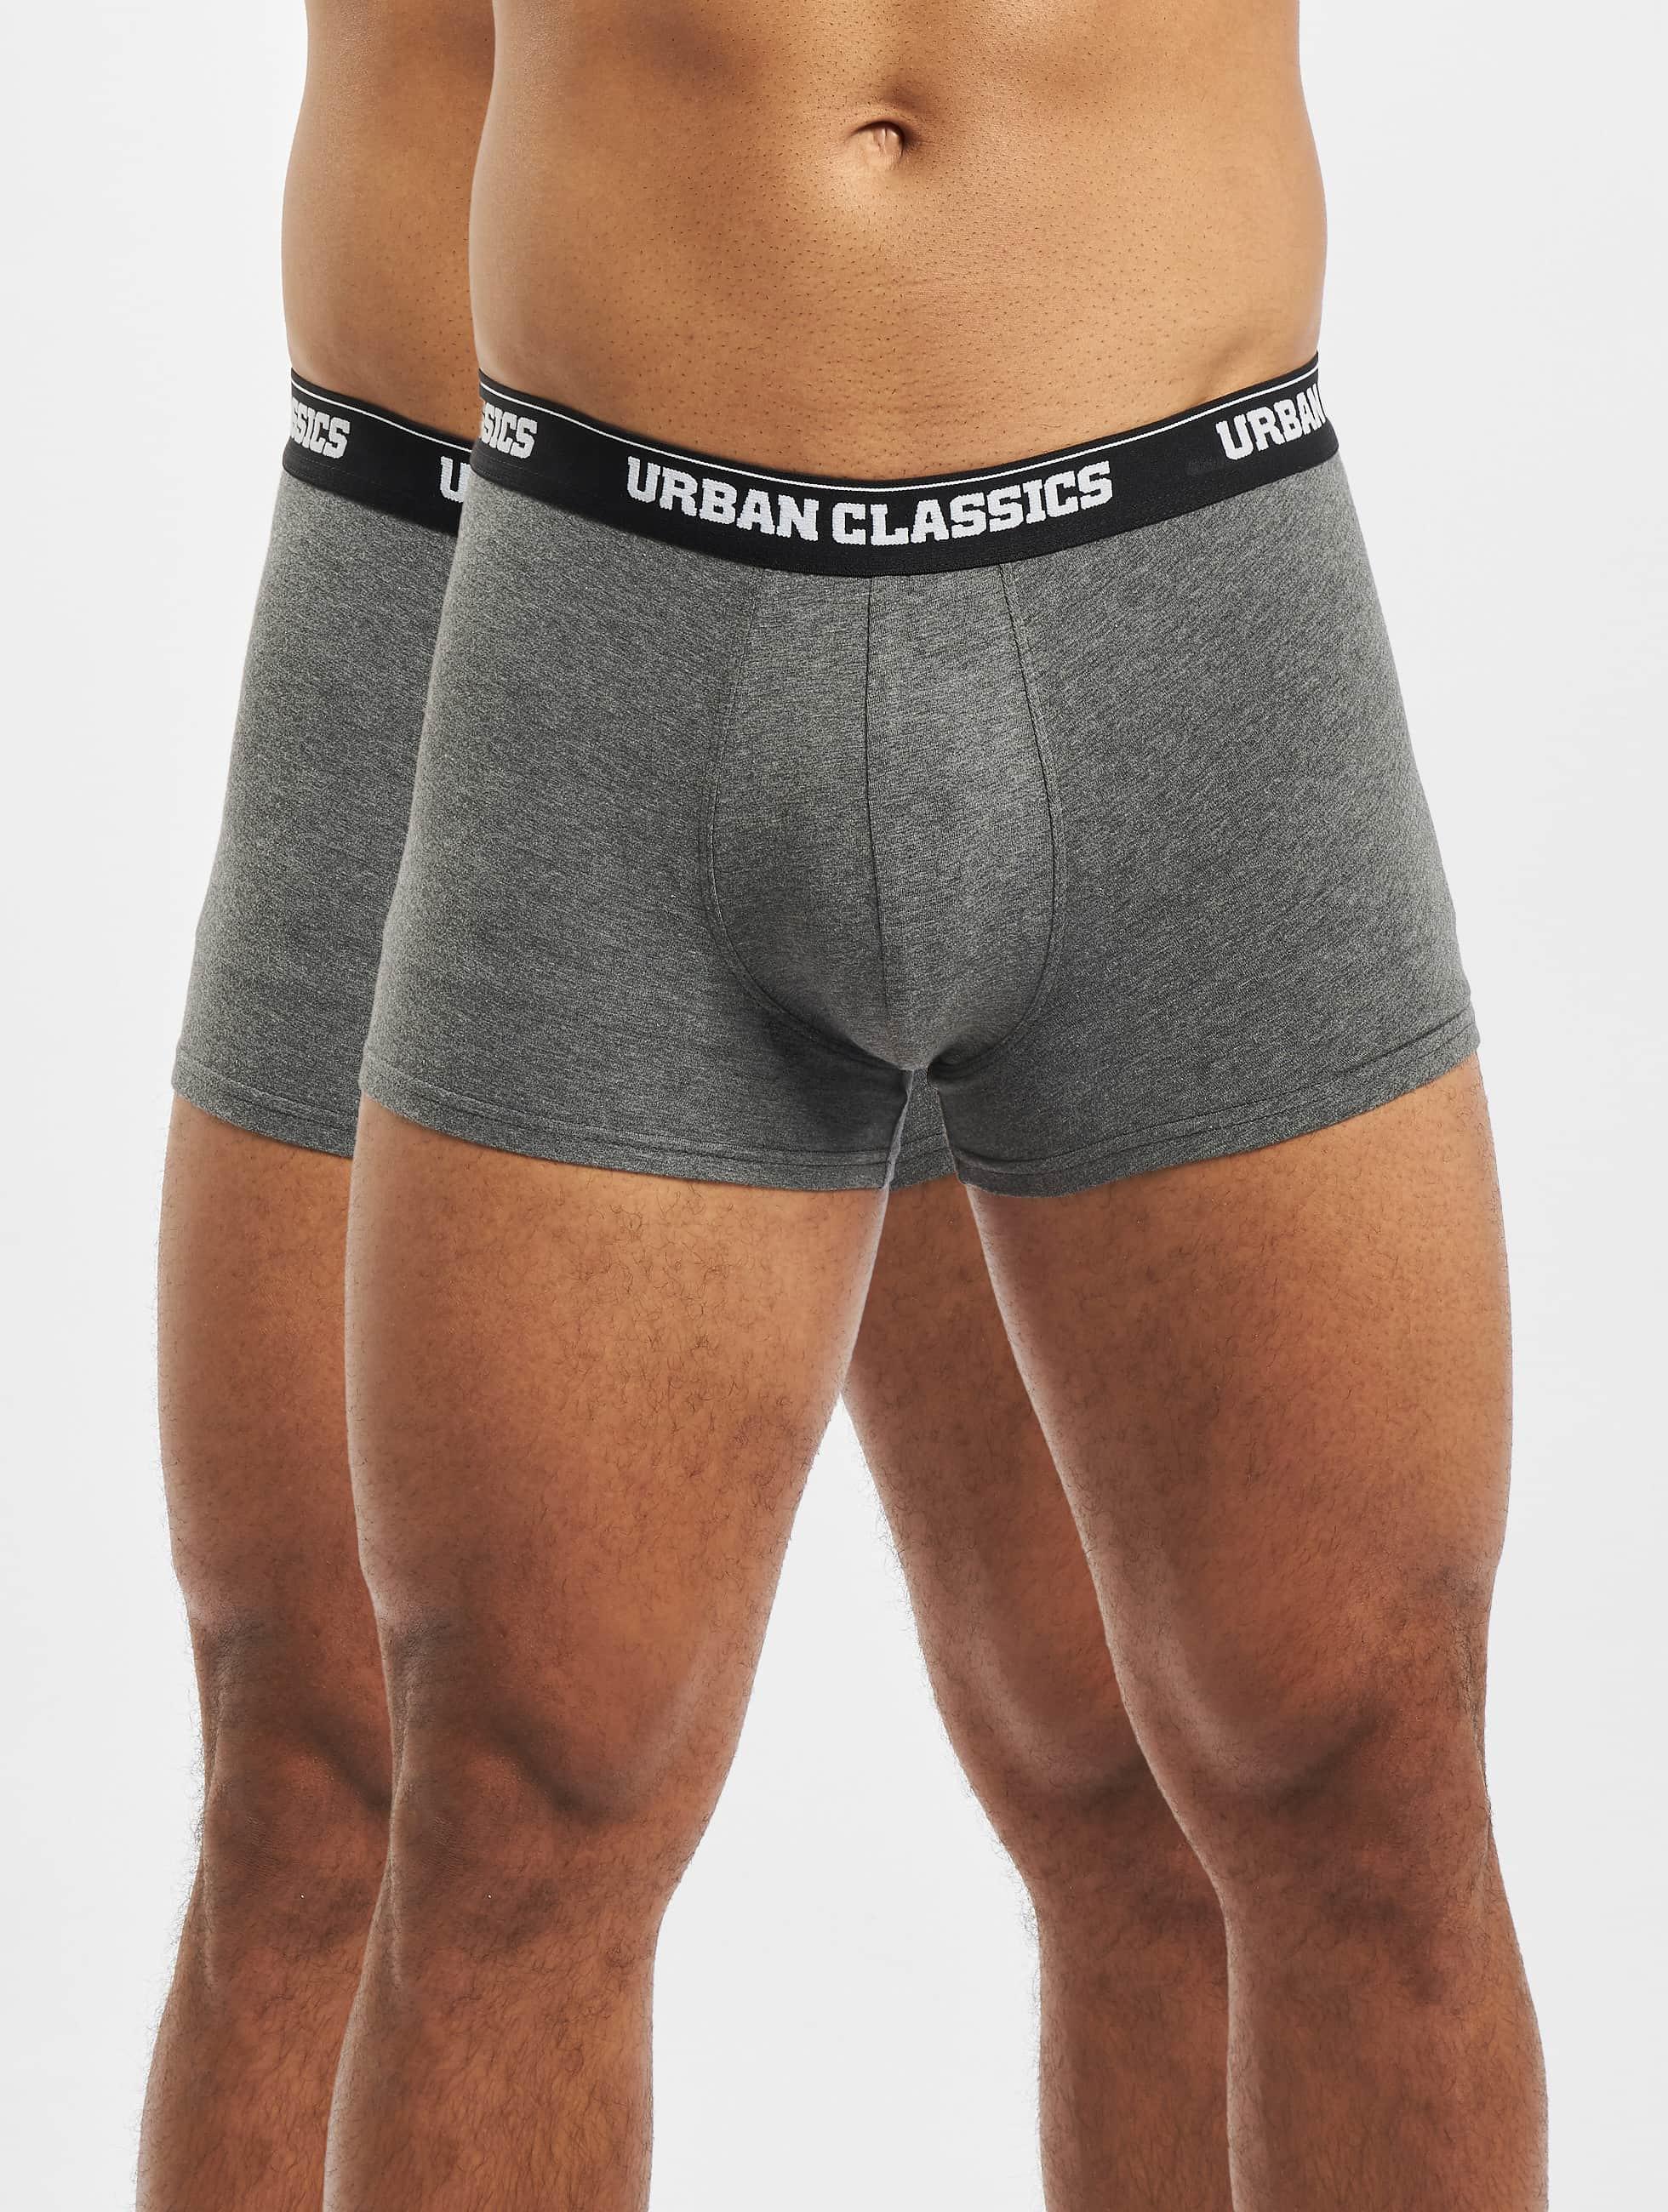 Urban Classics Boxershorts Mens Double Pack grau